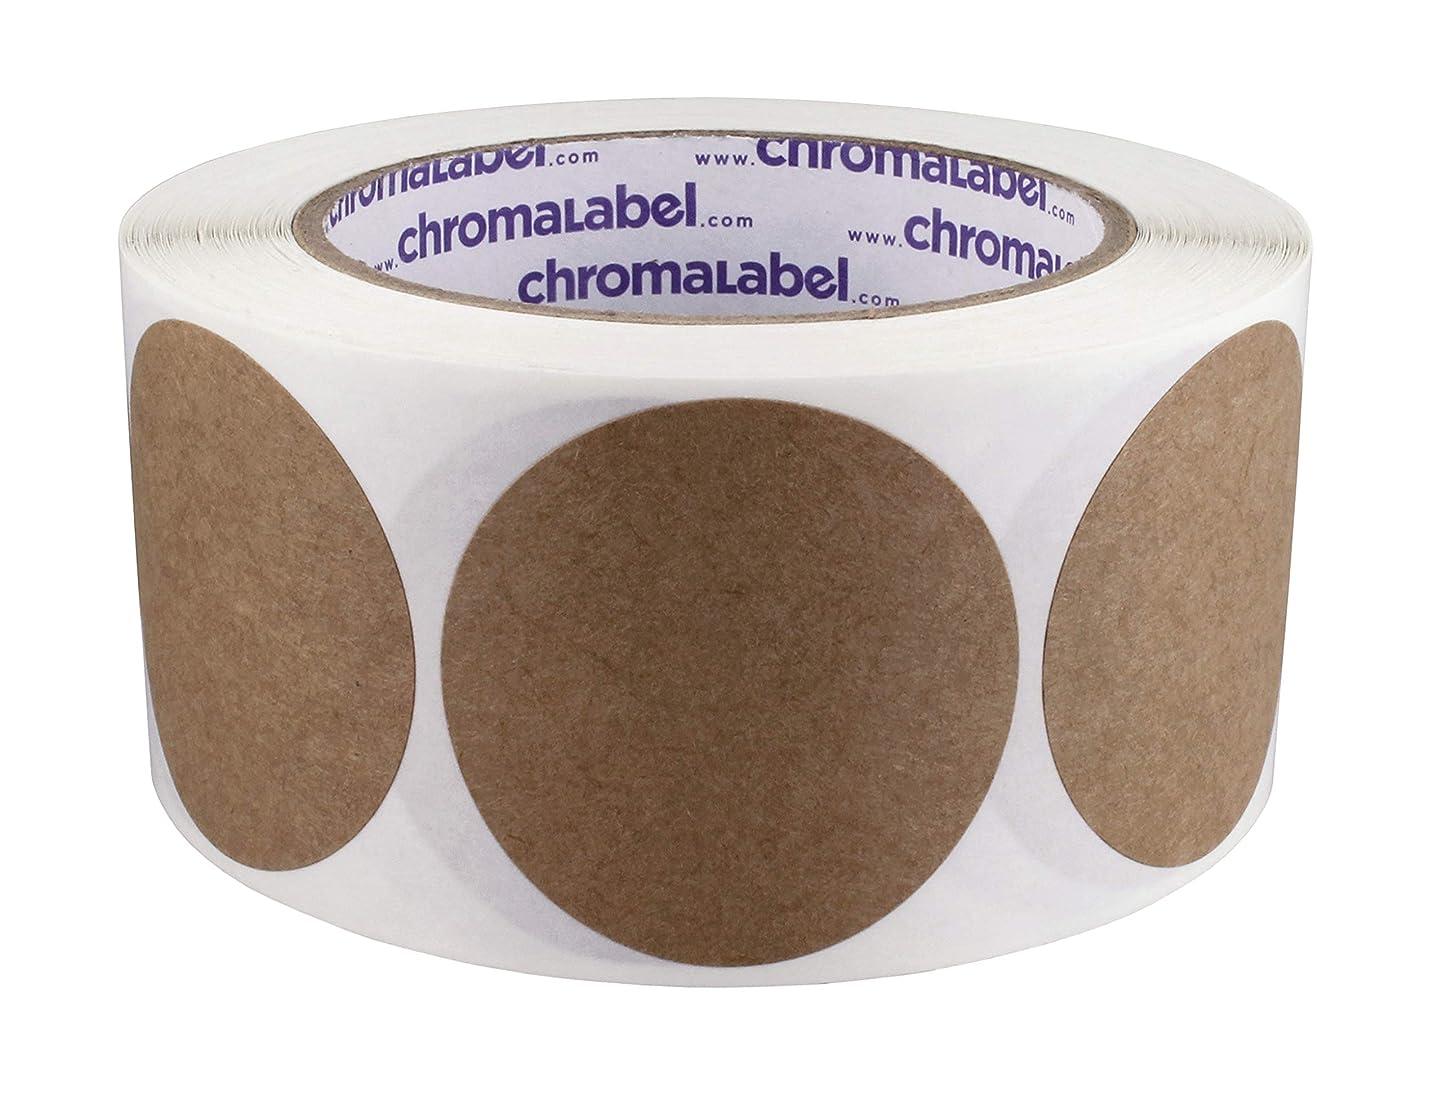 ChromaLabel Kraft Dot Labels | 500/Roll (2 inch) zovyuictcvf4